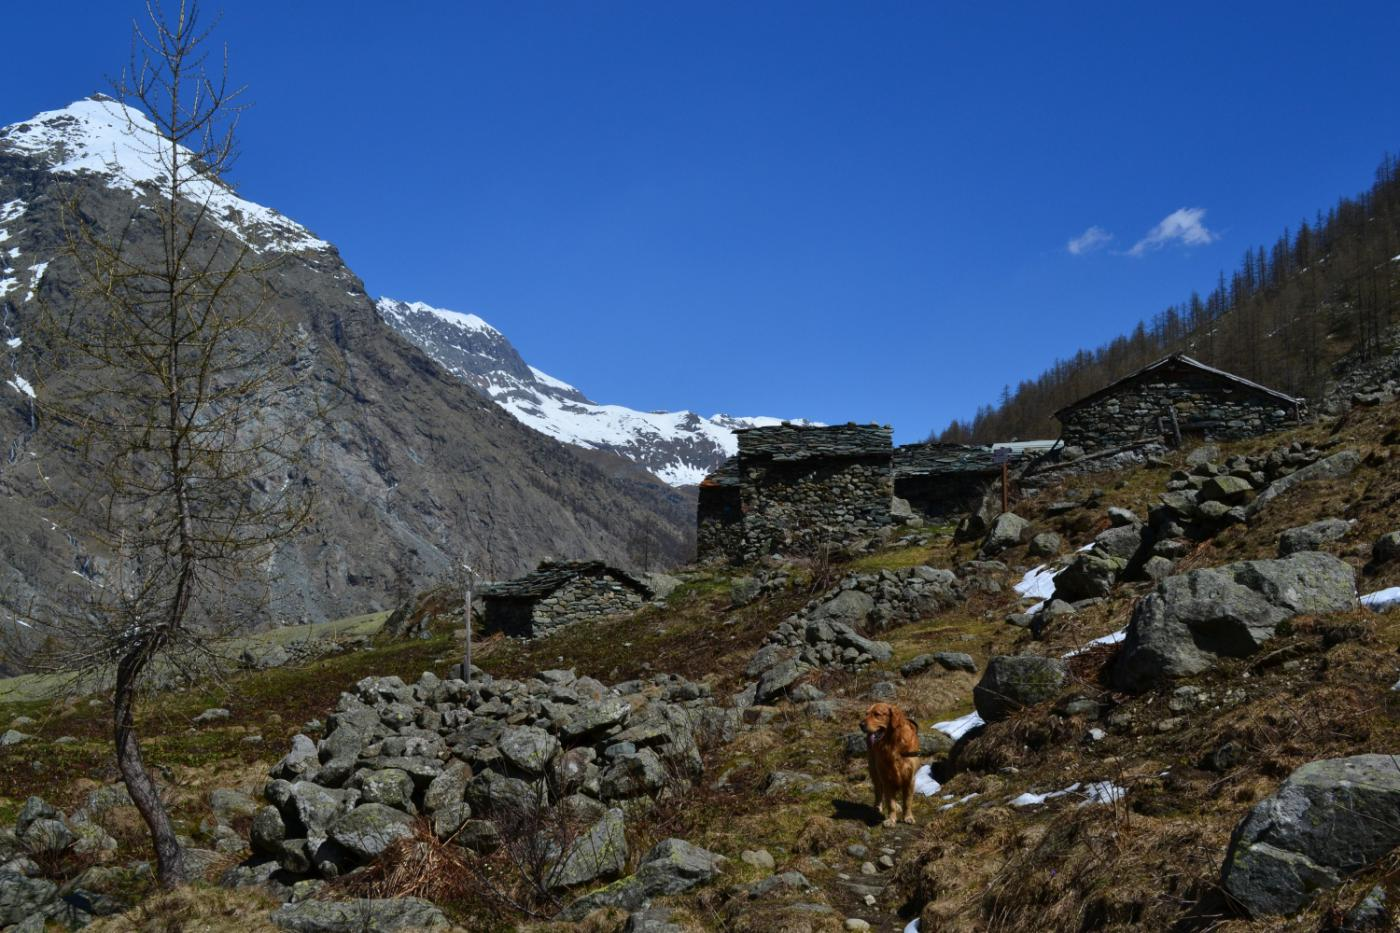 arrivo all'Alpe Pian Salè